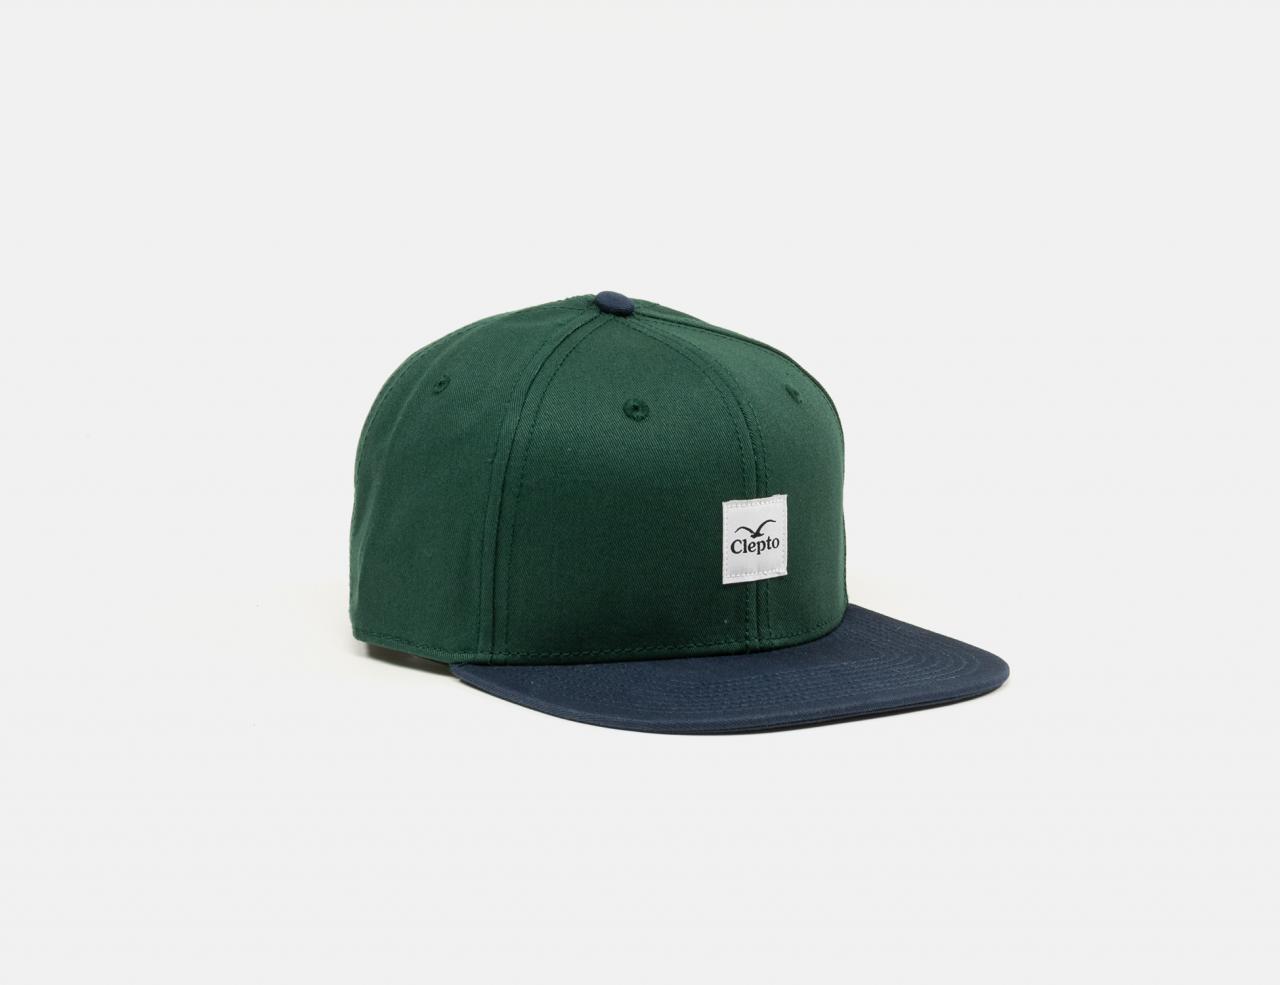 Cleptomanicx Badger 3 Cap - Bottle Green